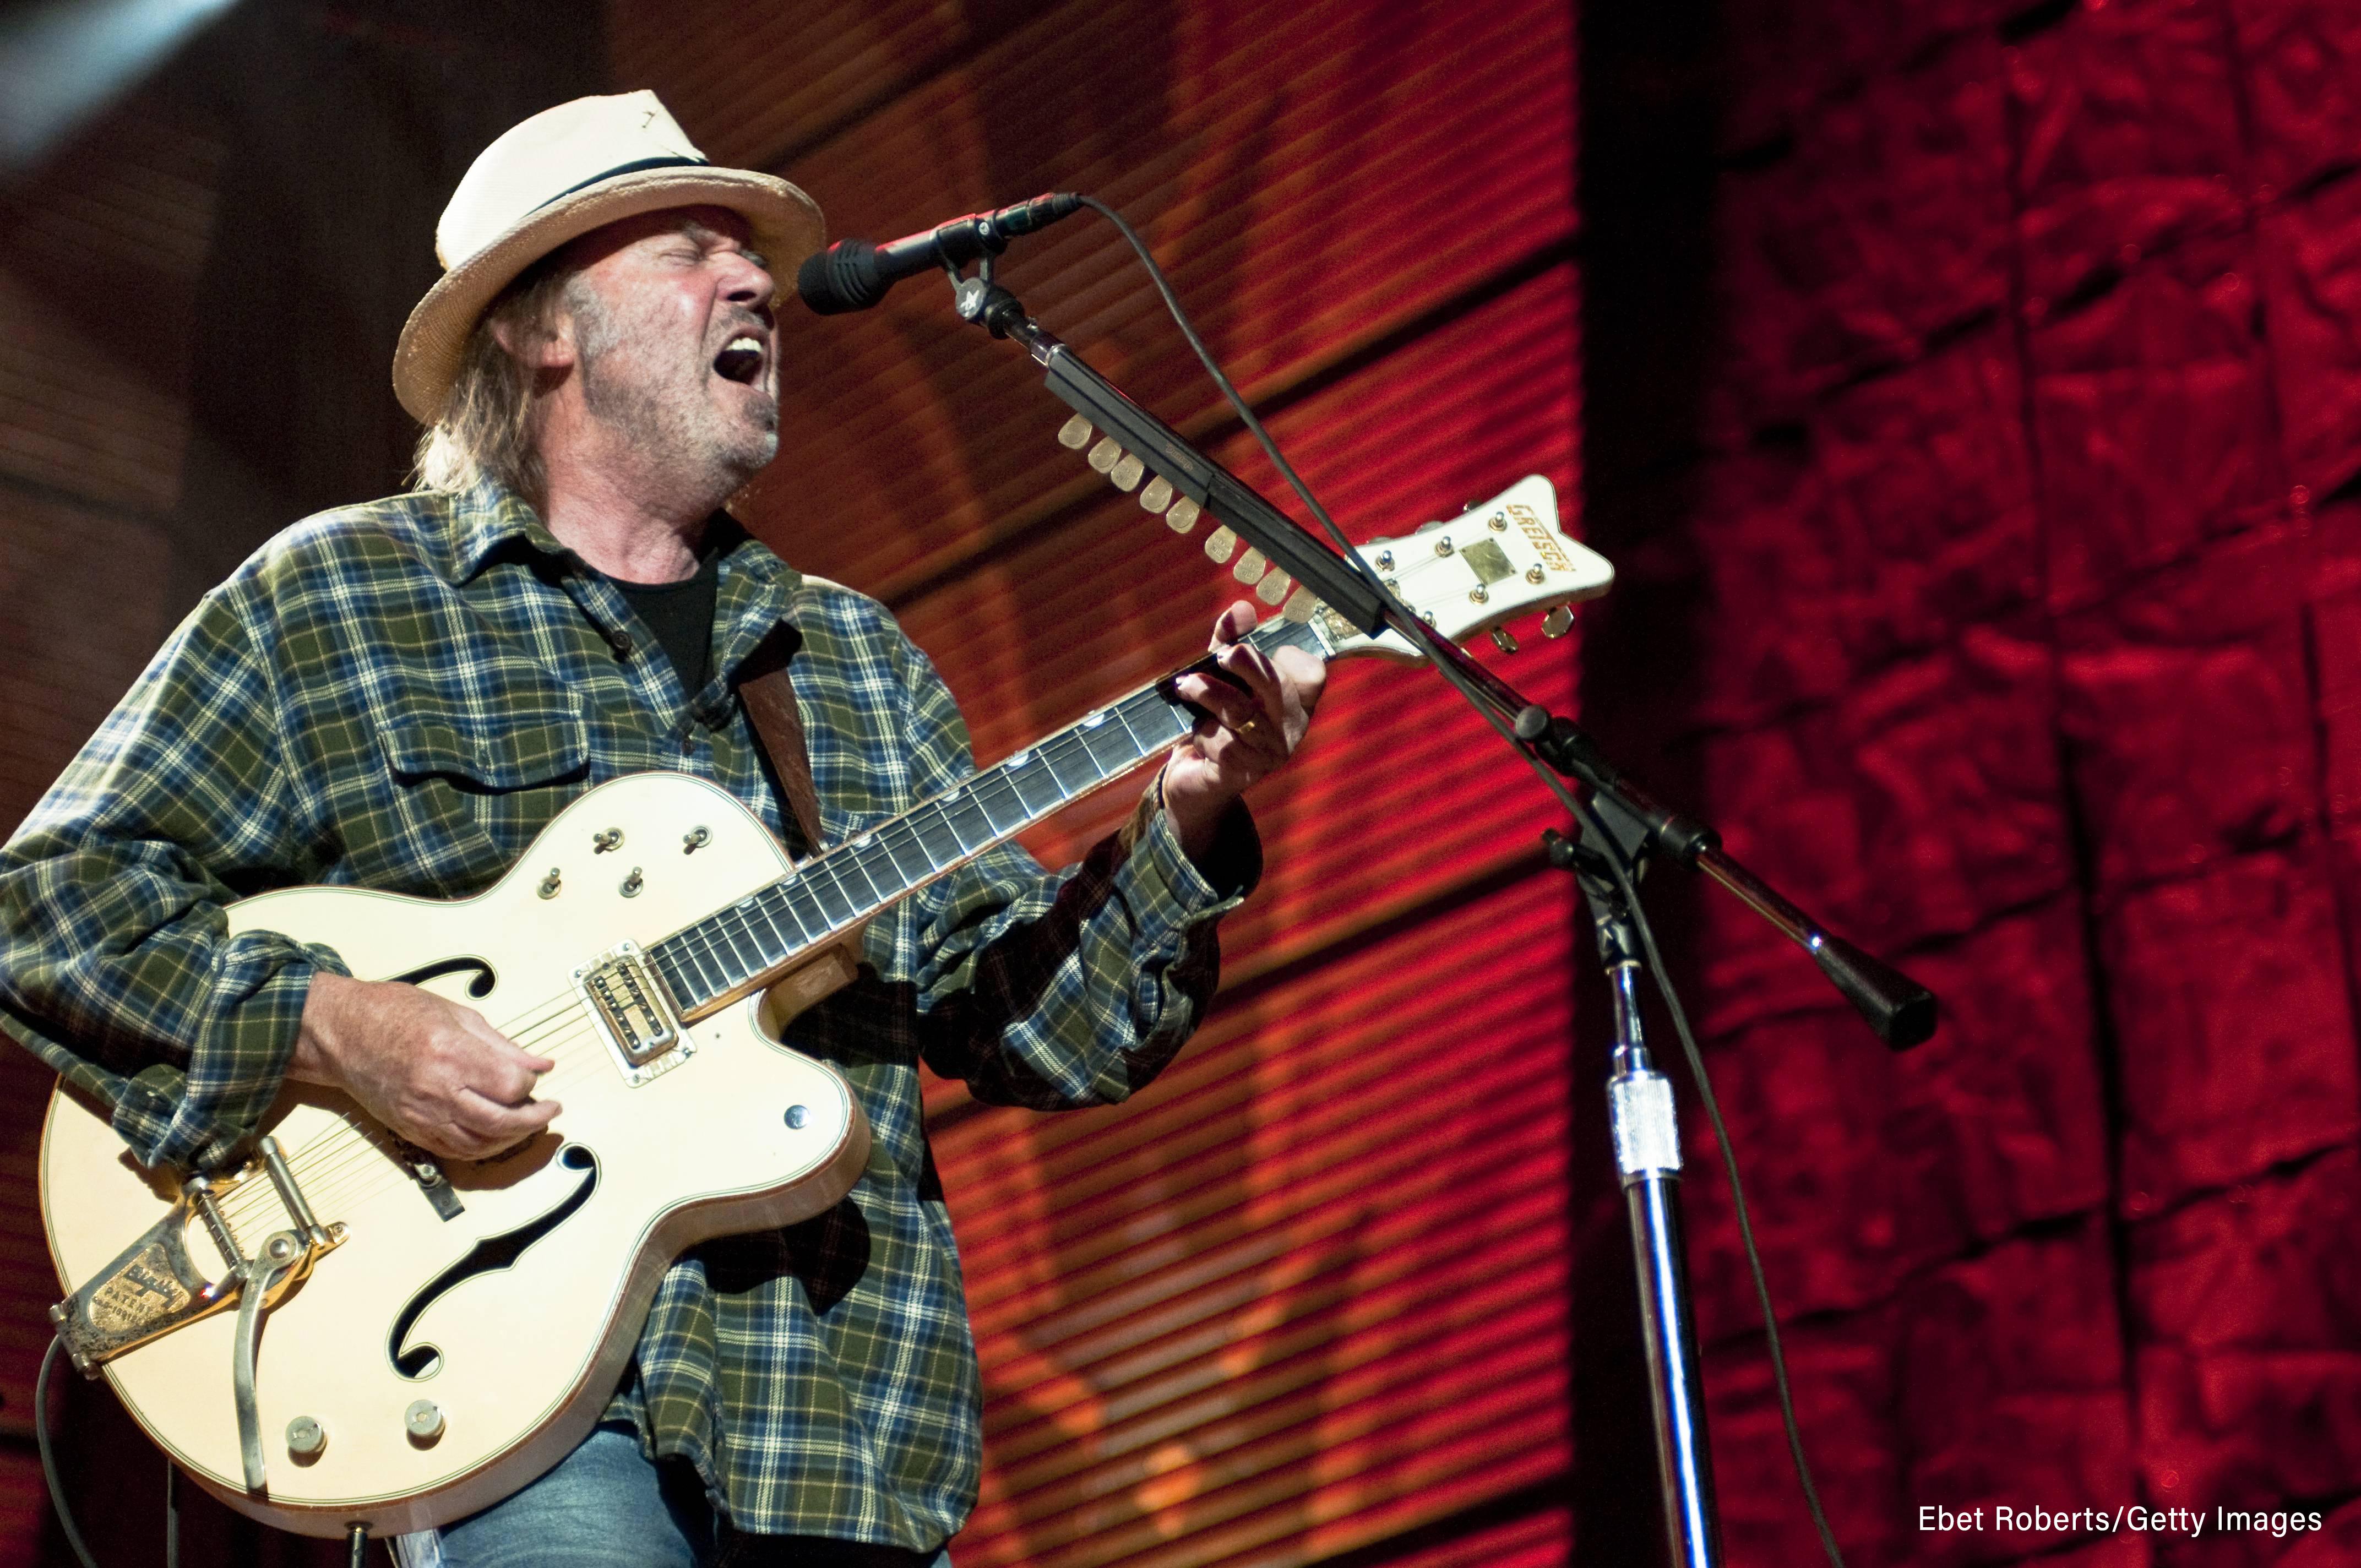 Neil Young Talks Recording 'Colorado' With Conan